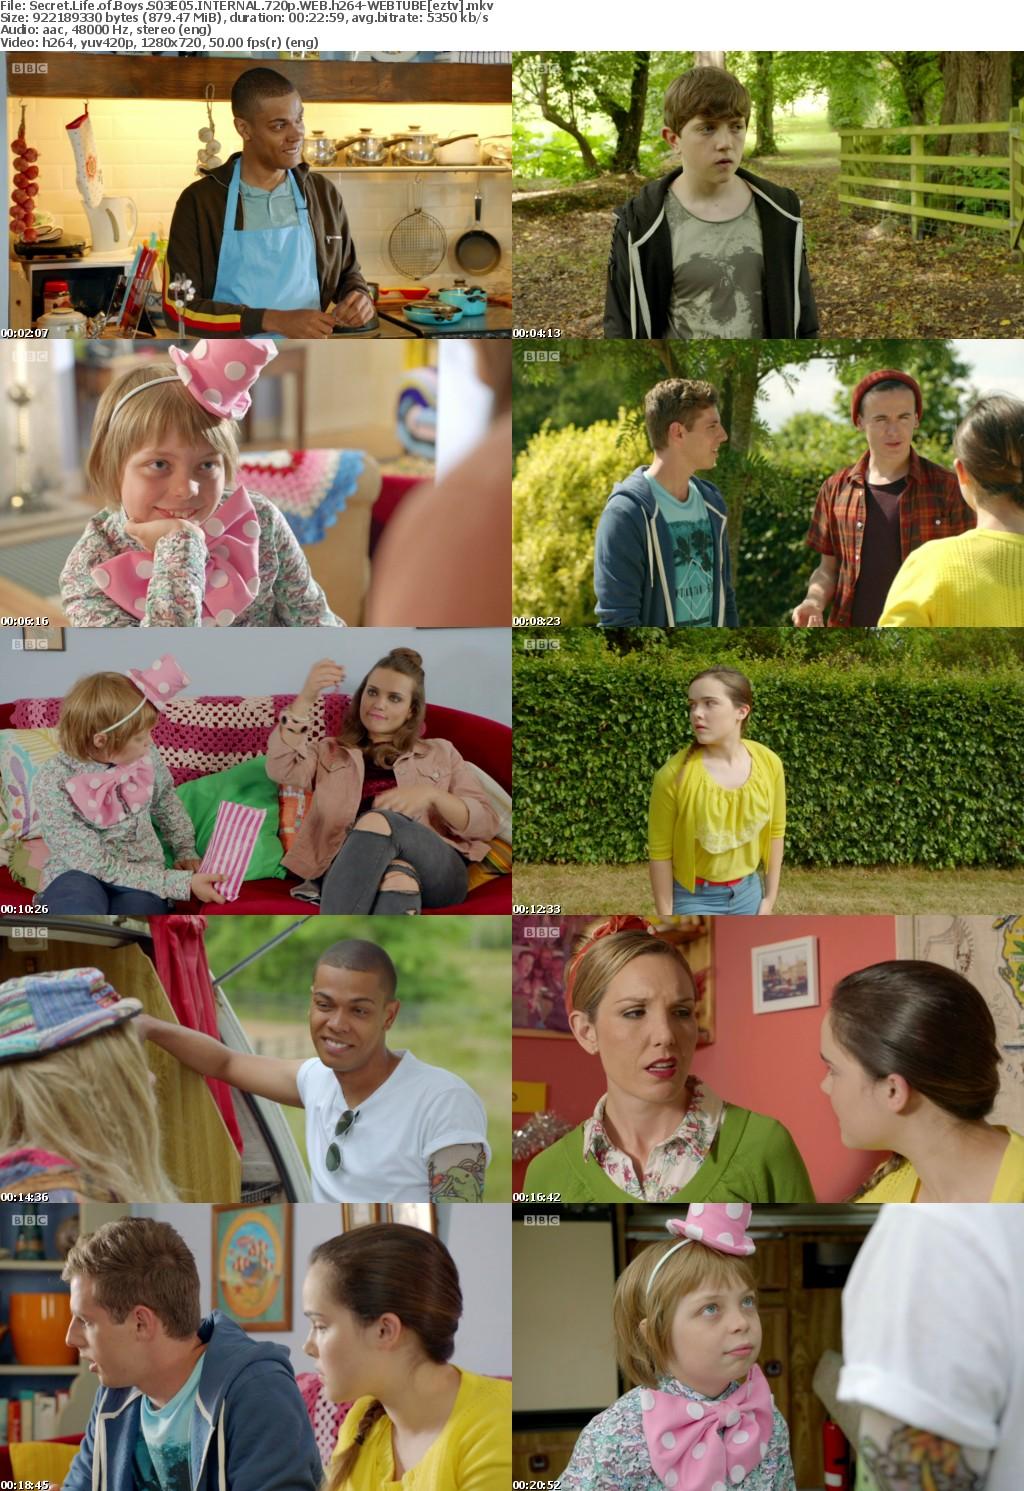 Secret Life of Boys S03E05 INTERNAL 720p WEB h264-WEBTUBE